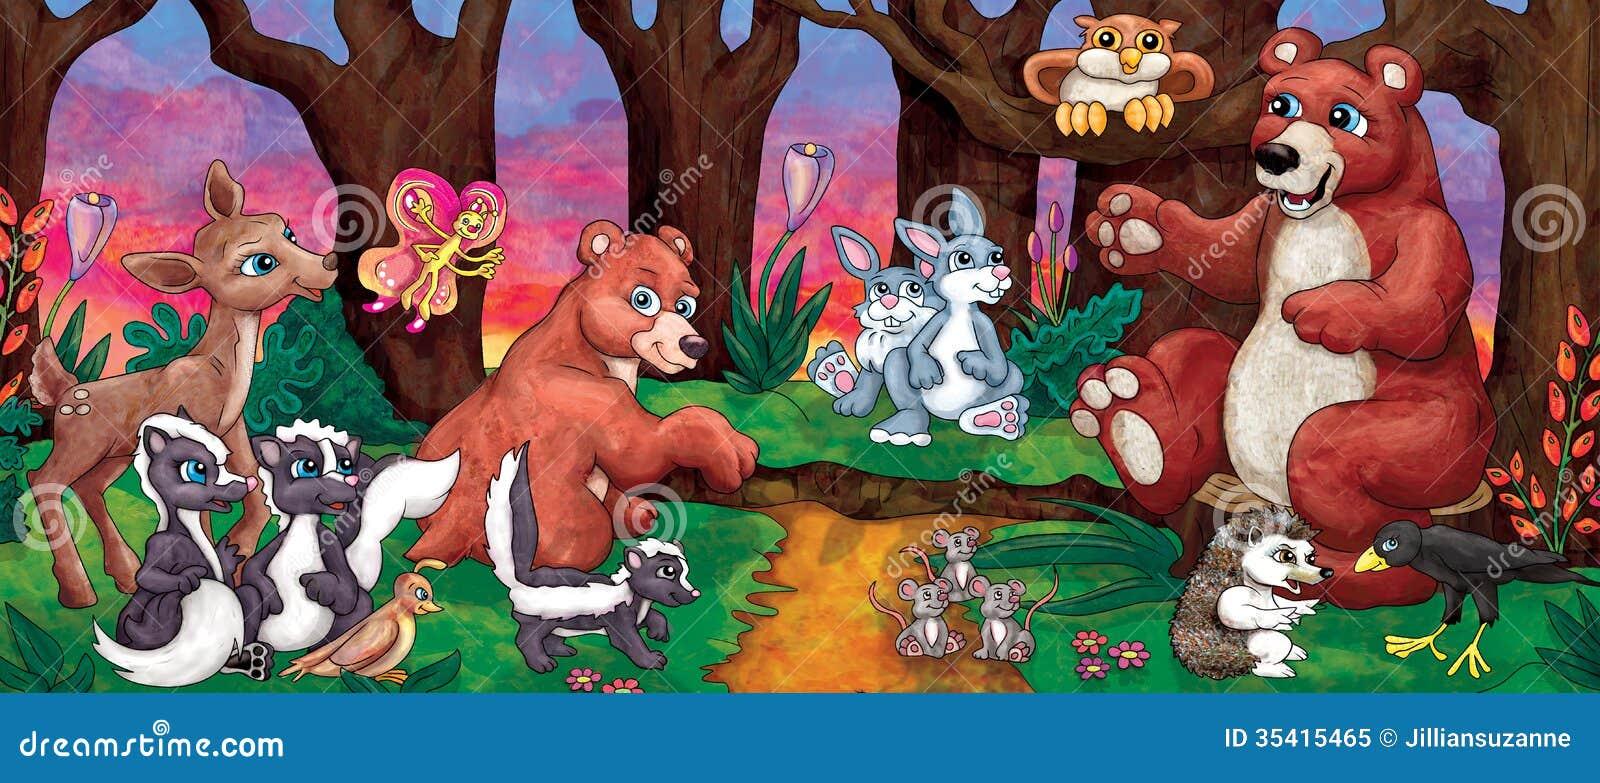 Cartoon Forest Animals Royalty Free Stock Photo Image 35415465